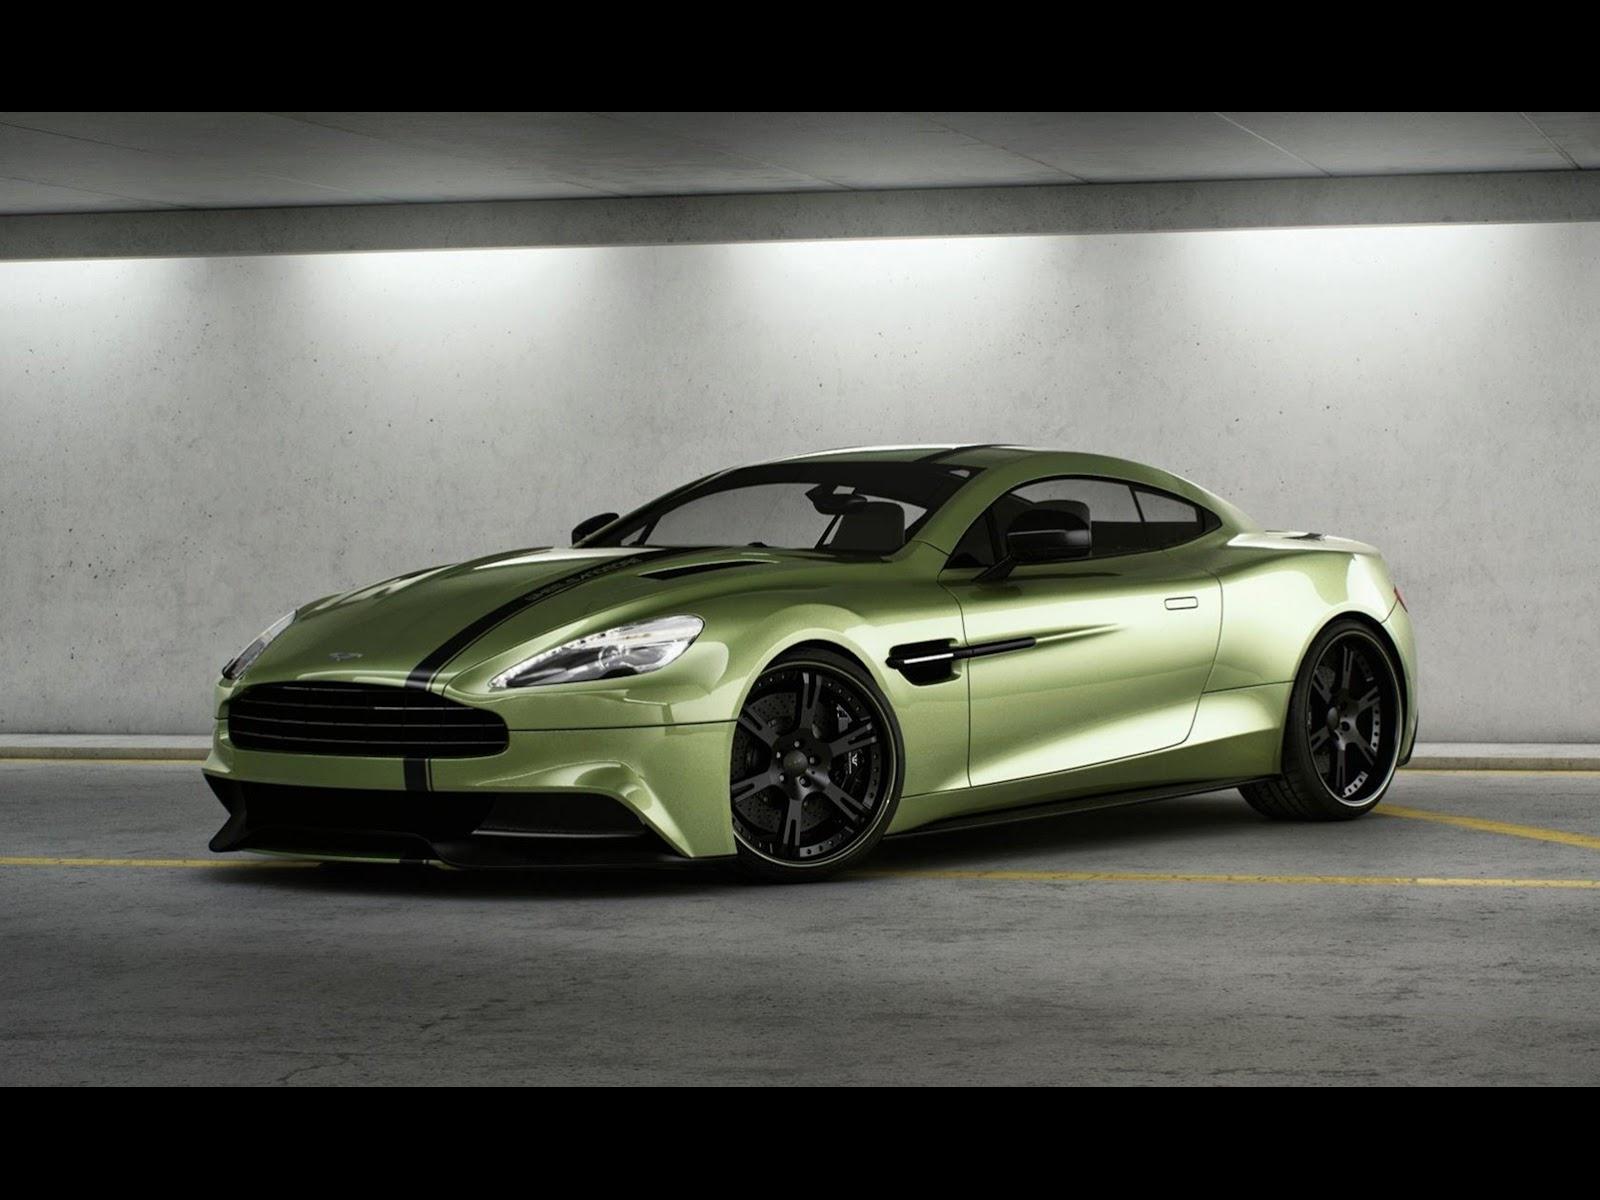 CAR NEWS LUX Przypakowany James Bond – Wheelsandmore Vanquish Stage